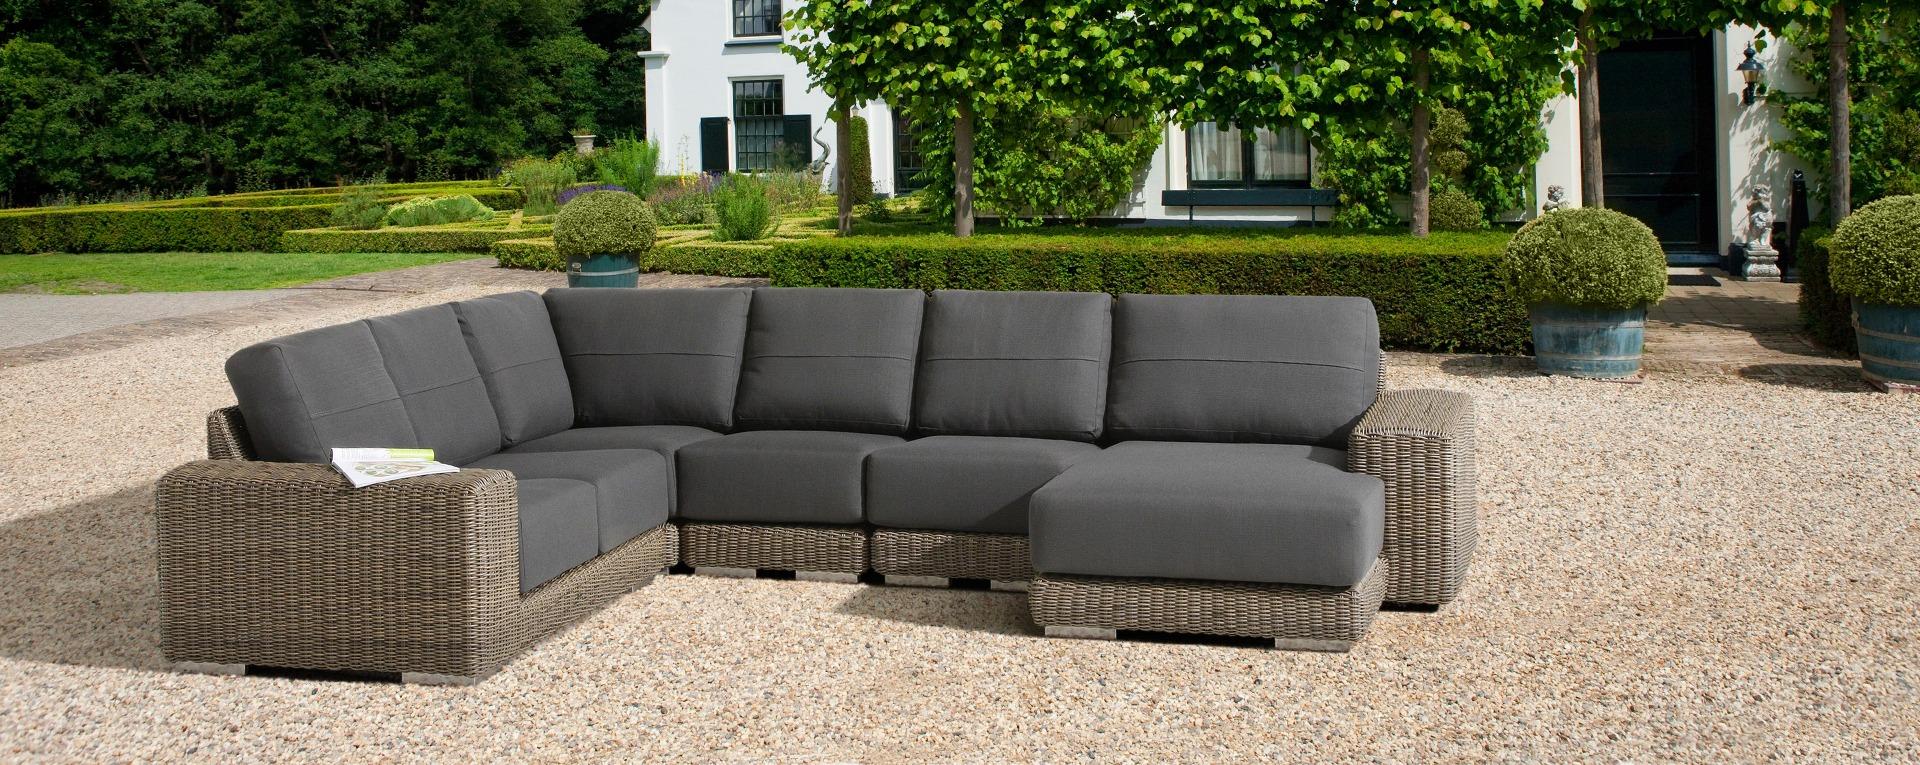 4 seasons outdoor kingston hoek loungeset pure best deal tuinmeubelen. Black Bedroom Furniture Sets. Home Design Ideas